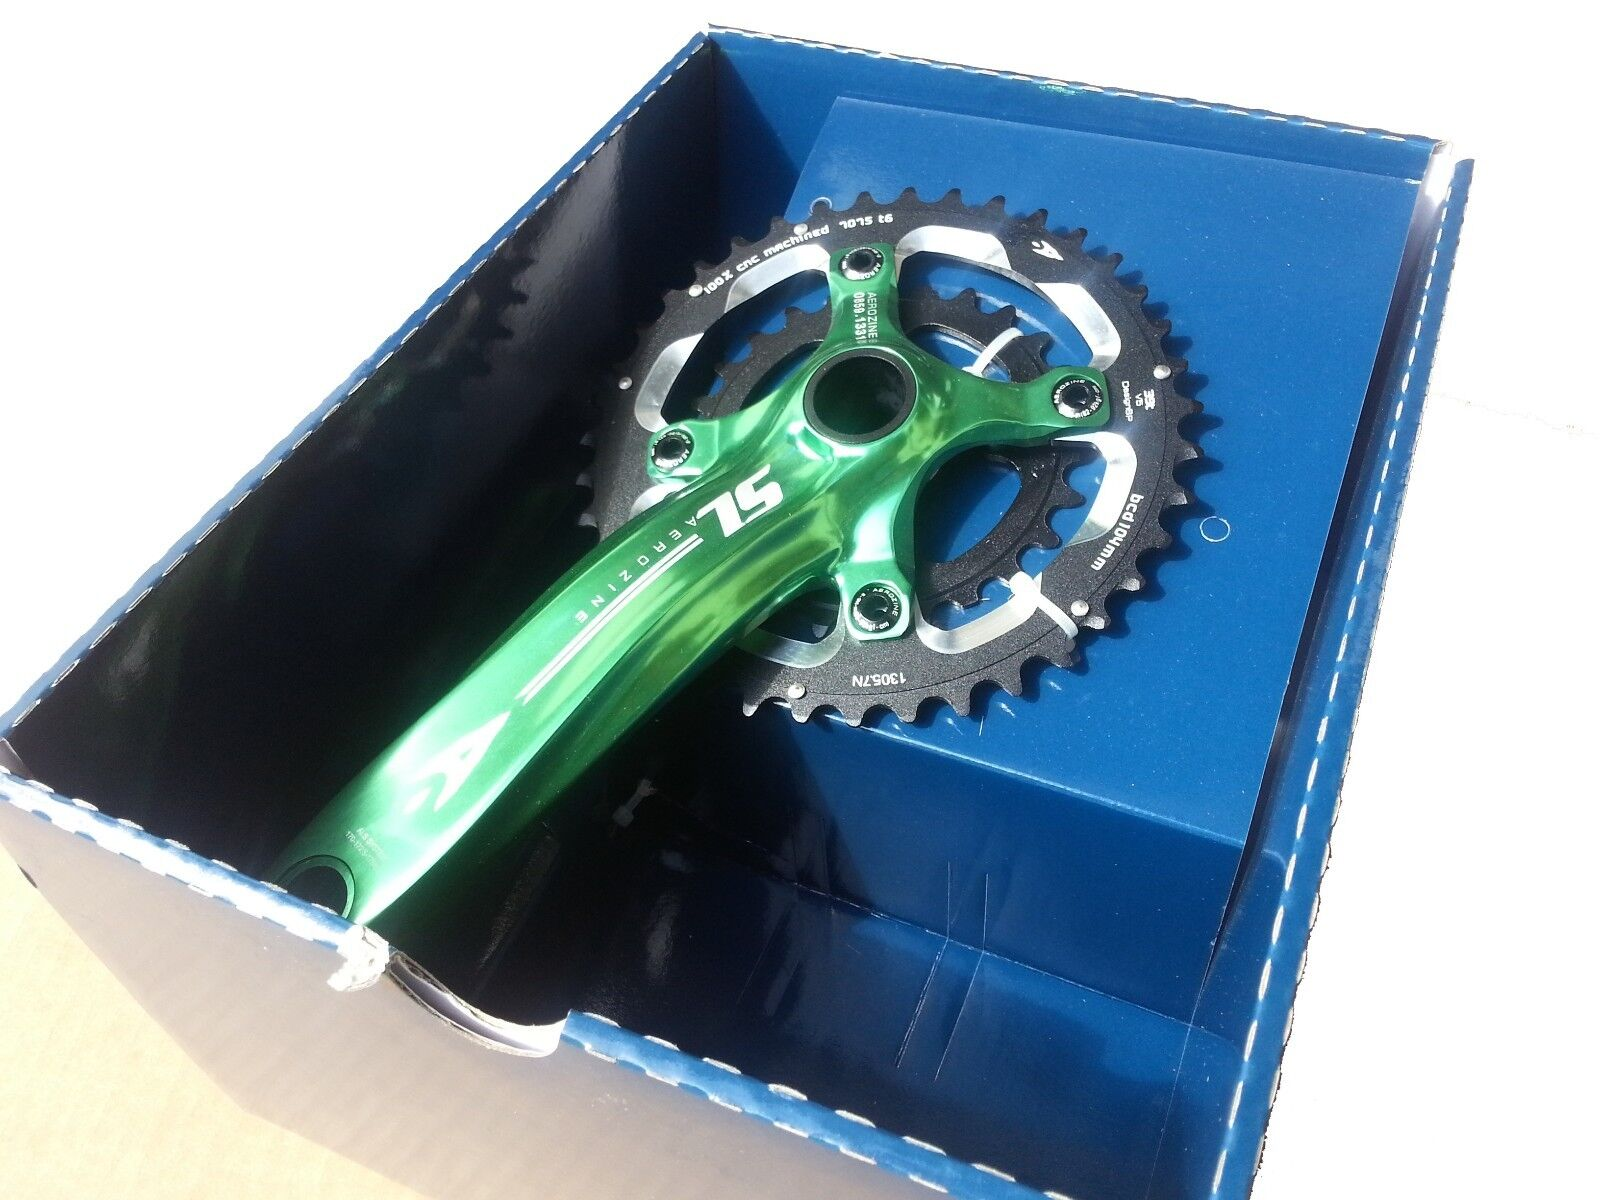 Aerozine  Mountain Bike Crankset Double 39 26 170mm 175mm X12SL A2D 2x10 GREEN  wholesale cheap